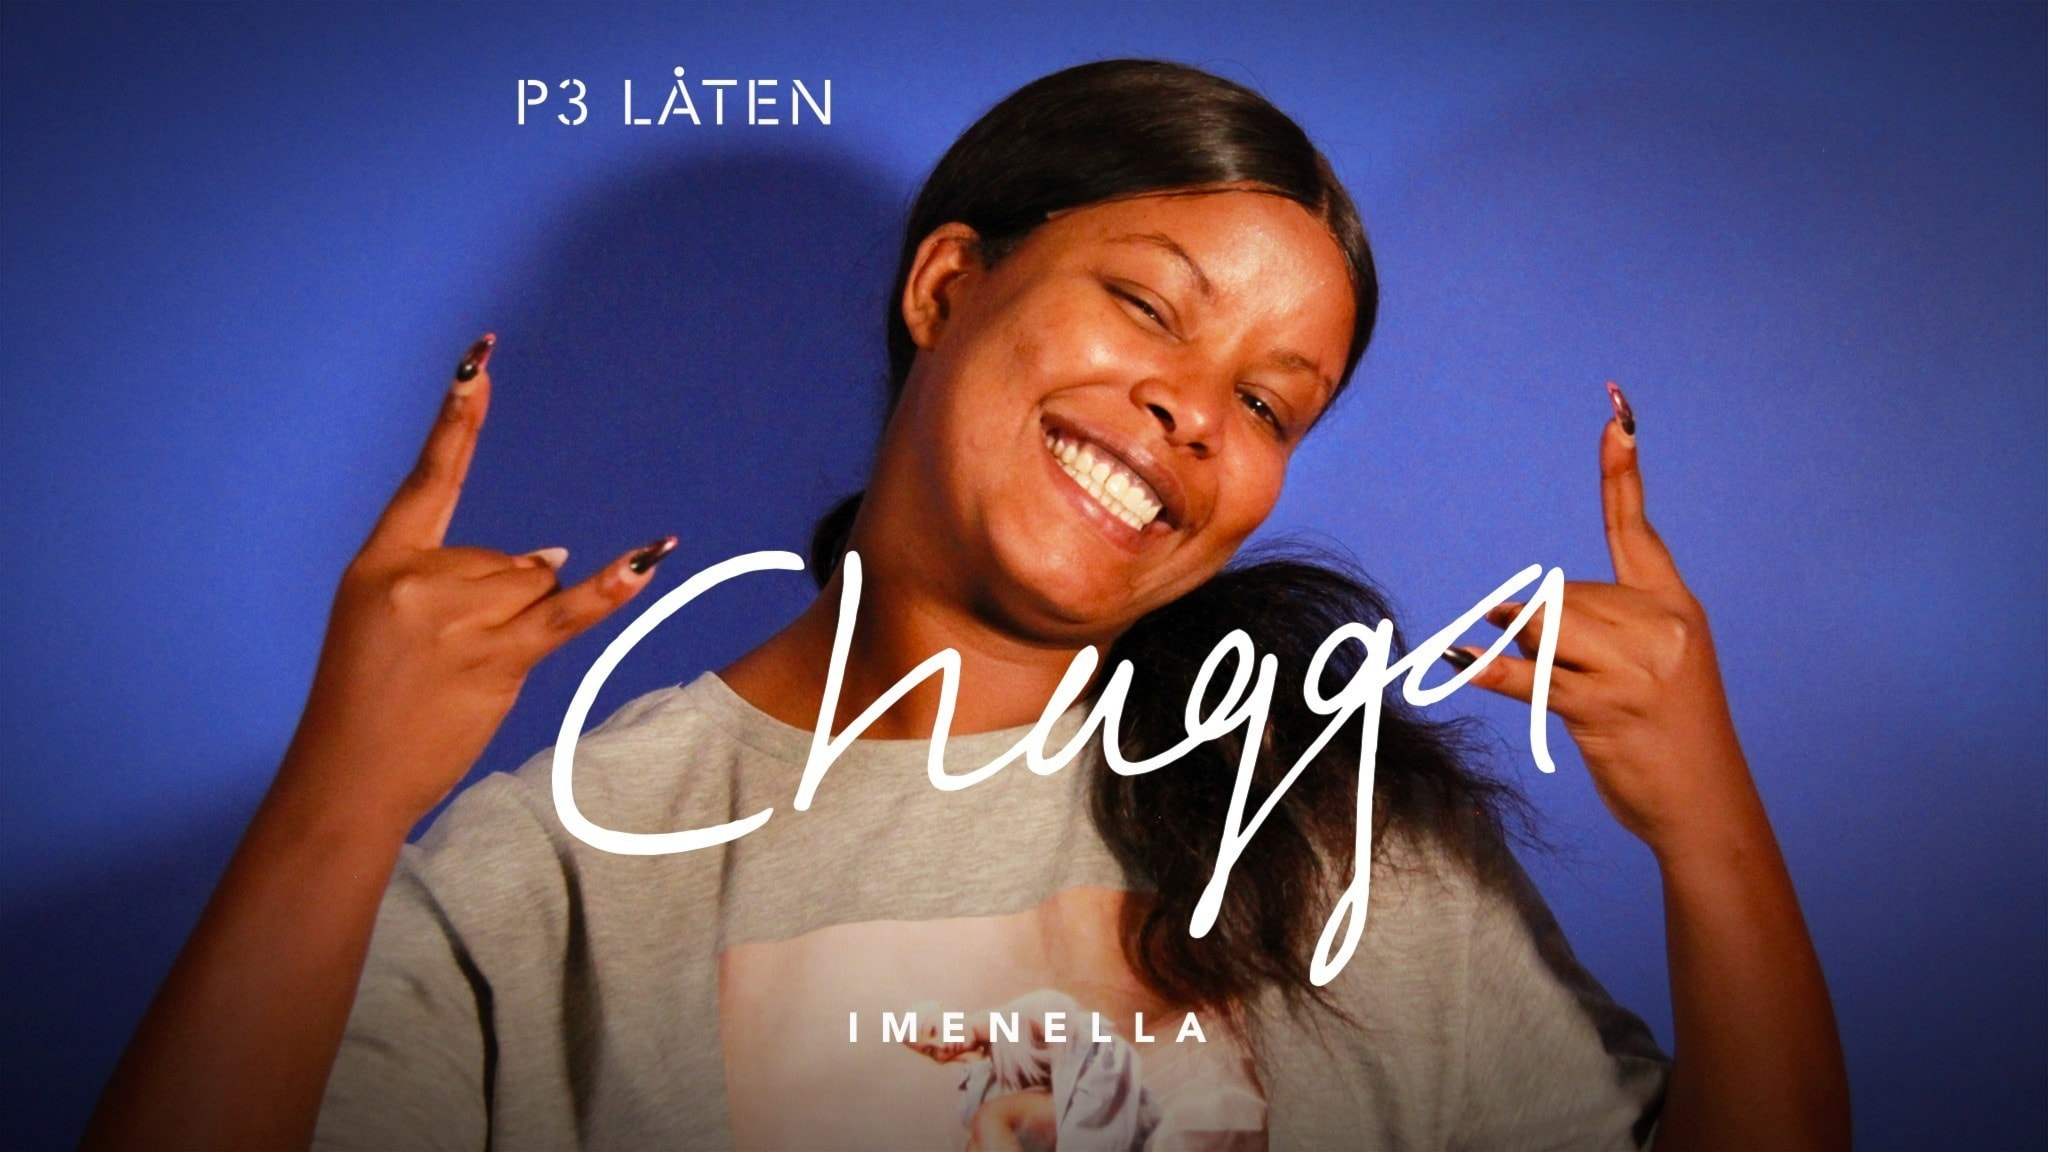 Imenella - Chagga